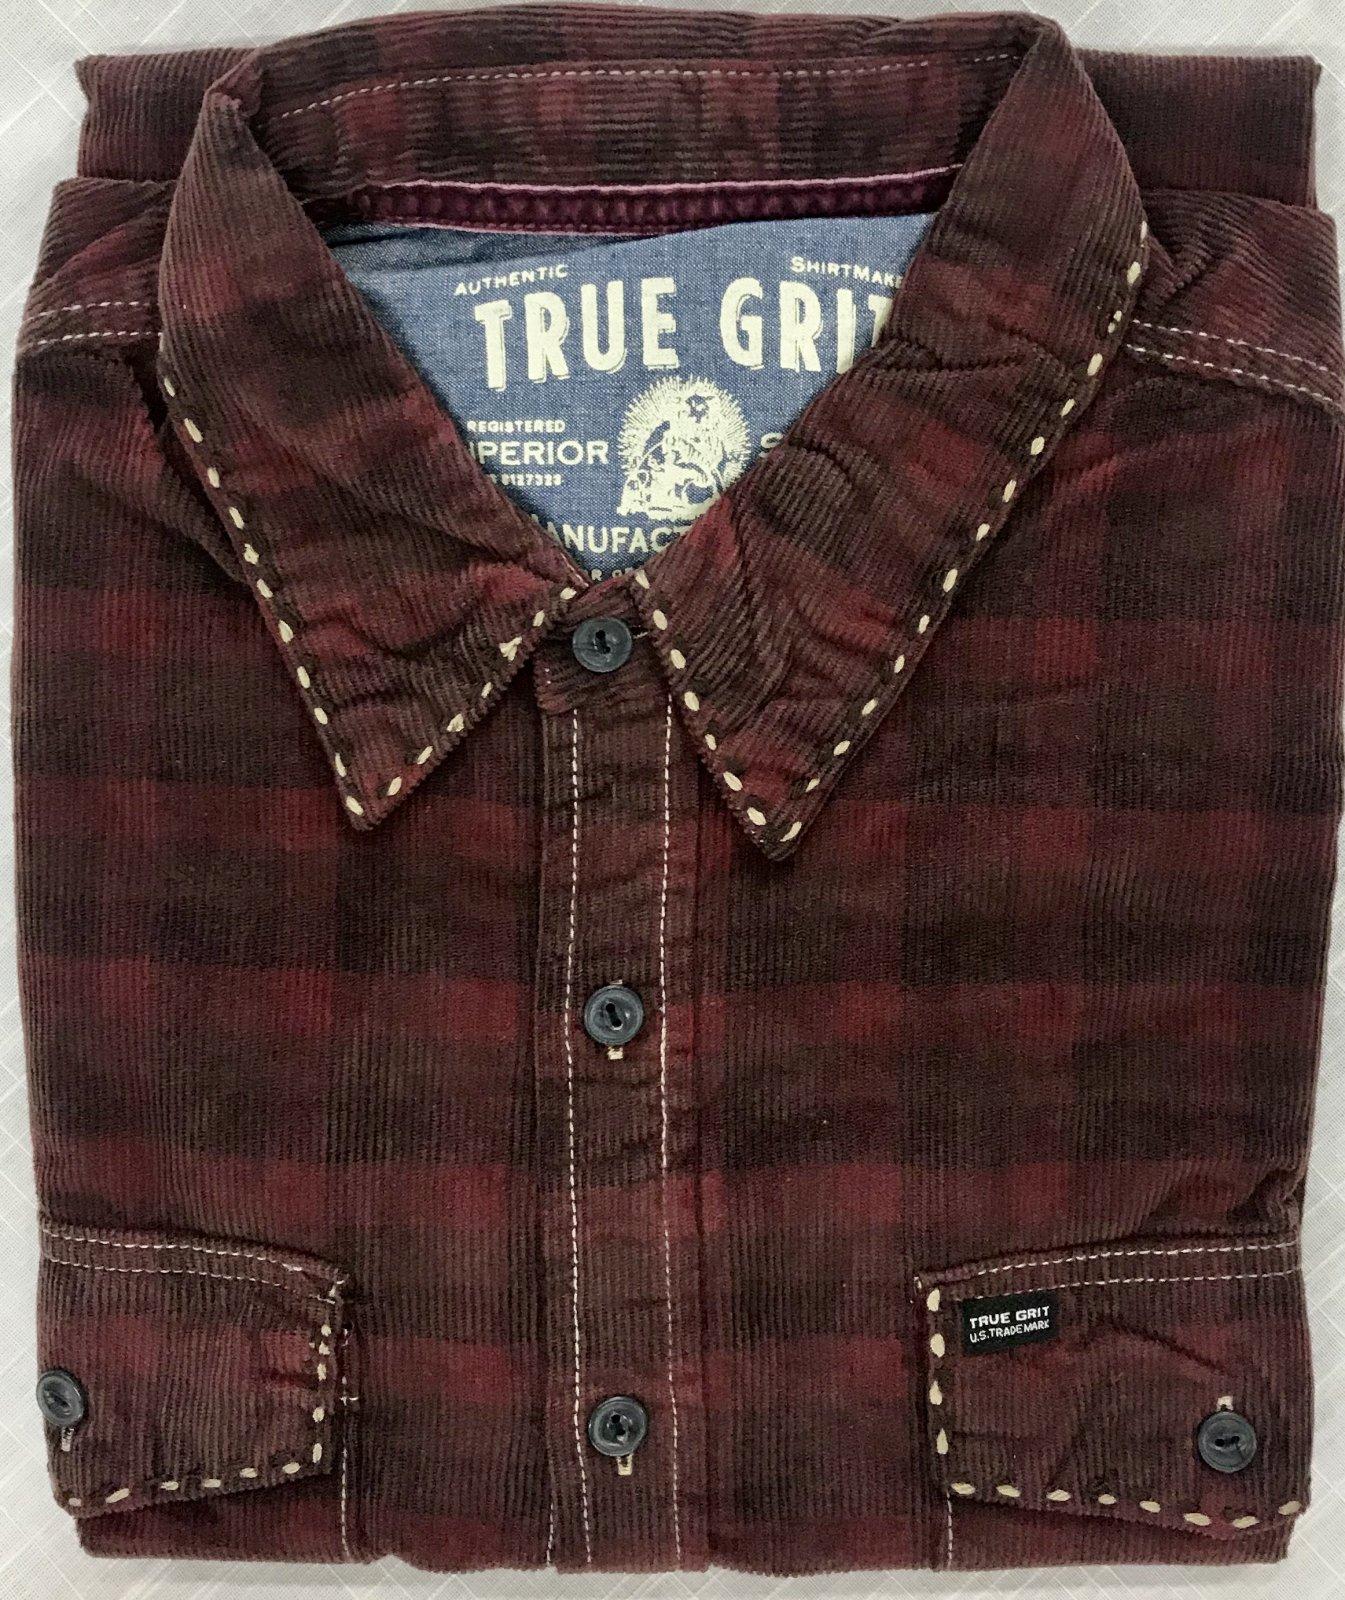 True Grit Vintage Plaid Canyon Cord LS Shirt